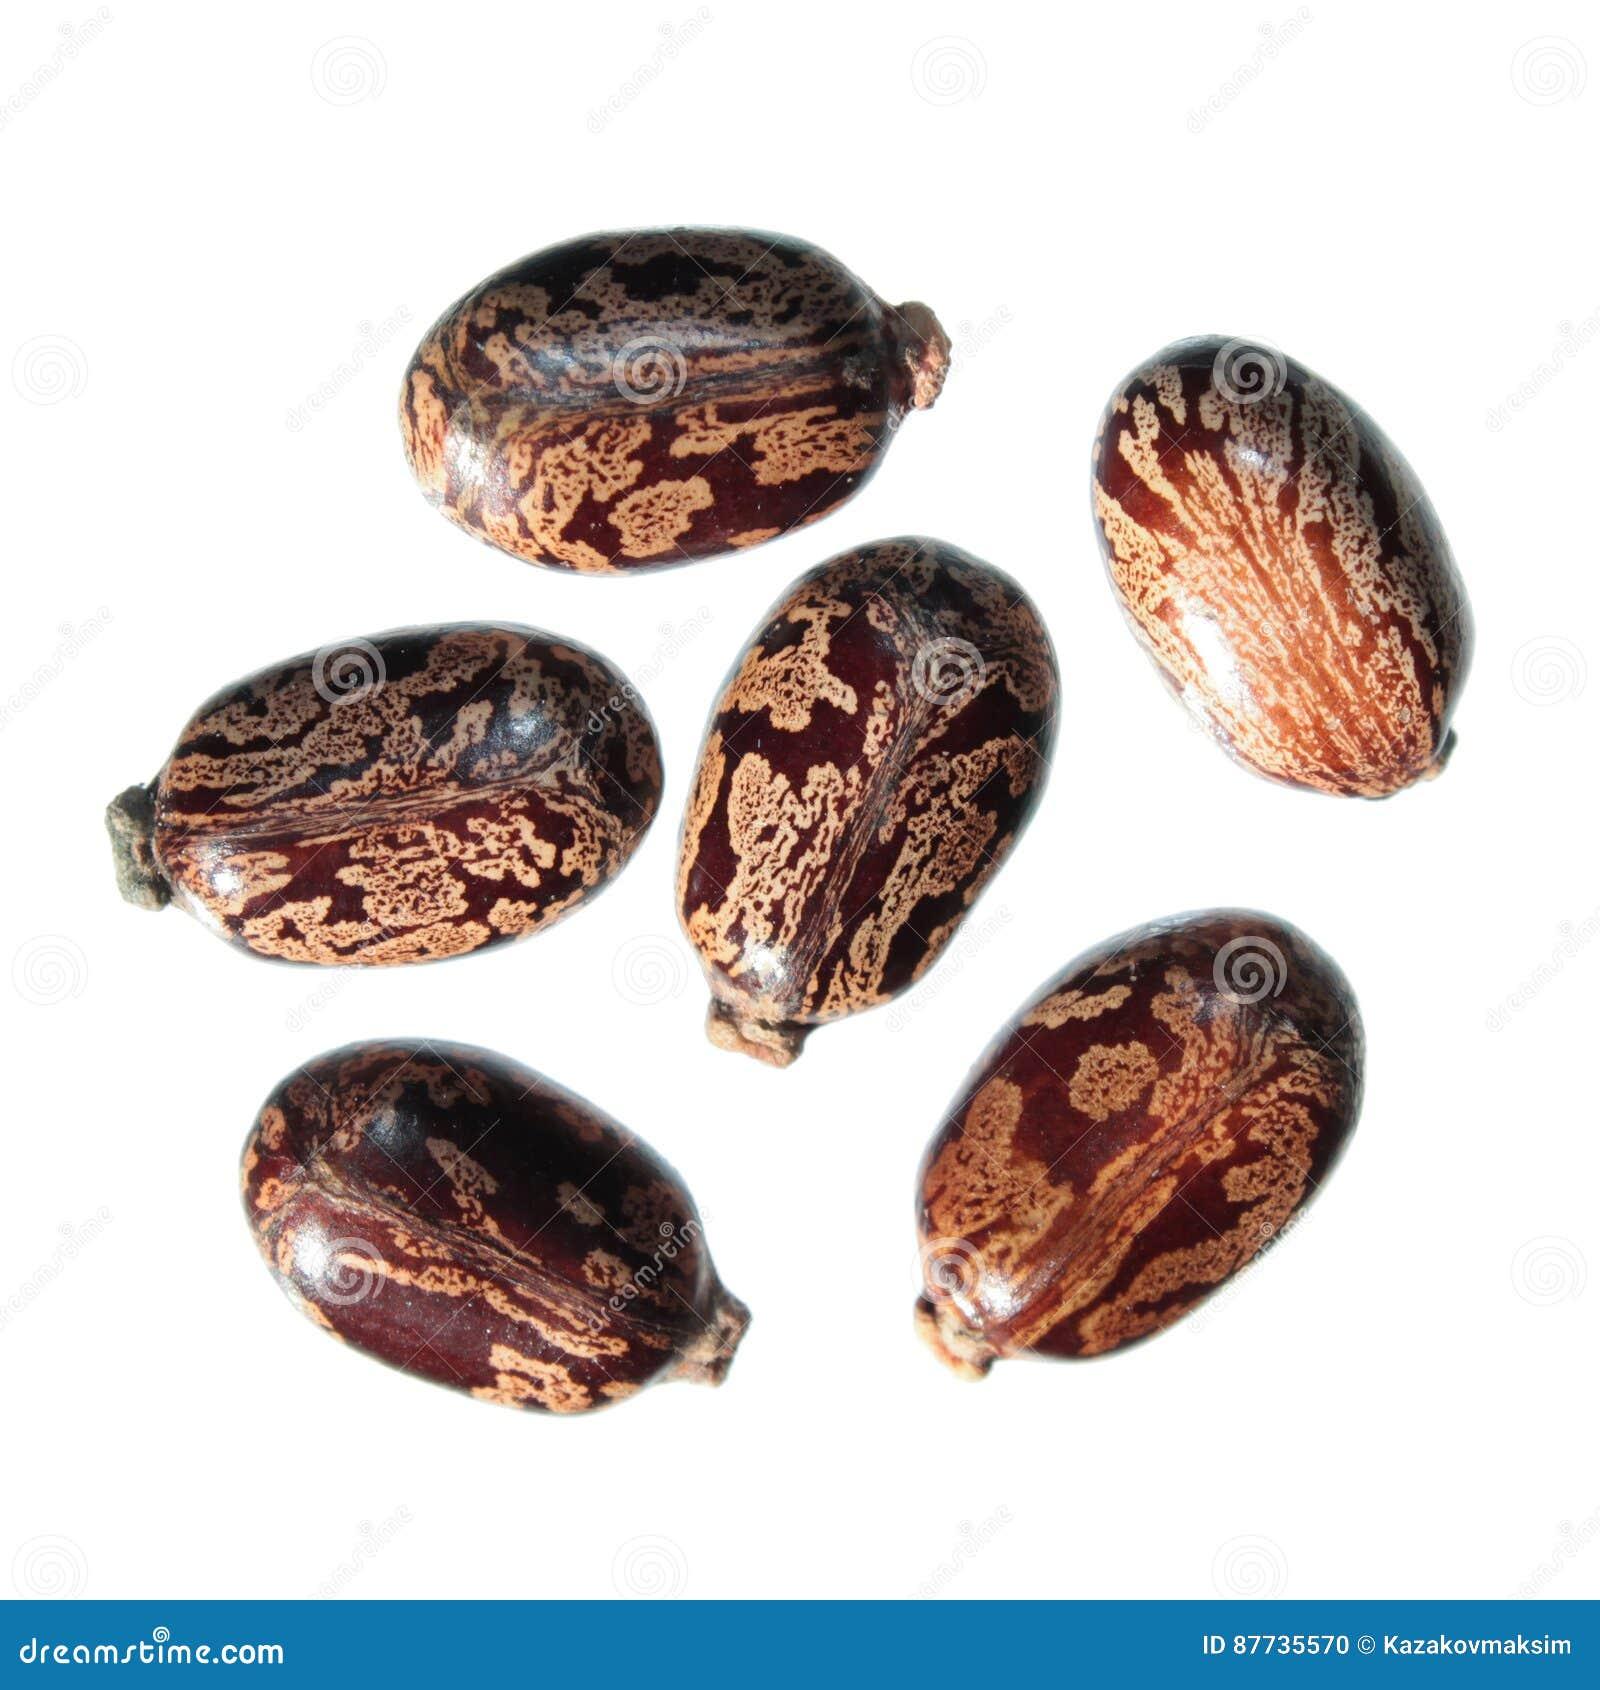 Seeds of Castor Bean Plant or Ricinus communis on white background